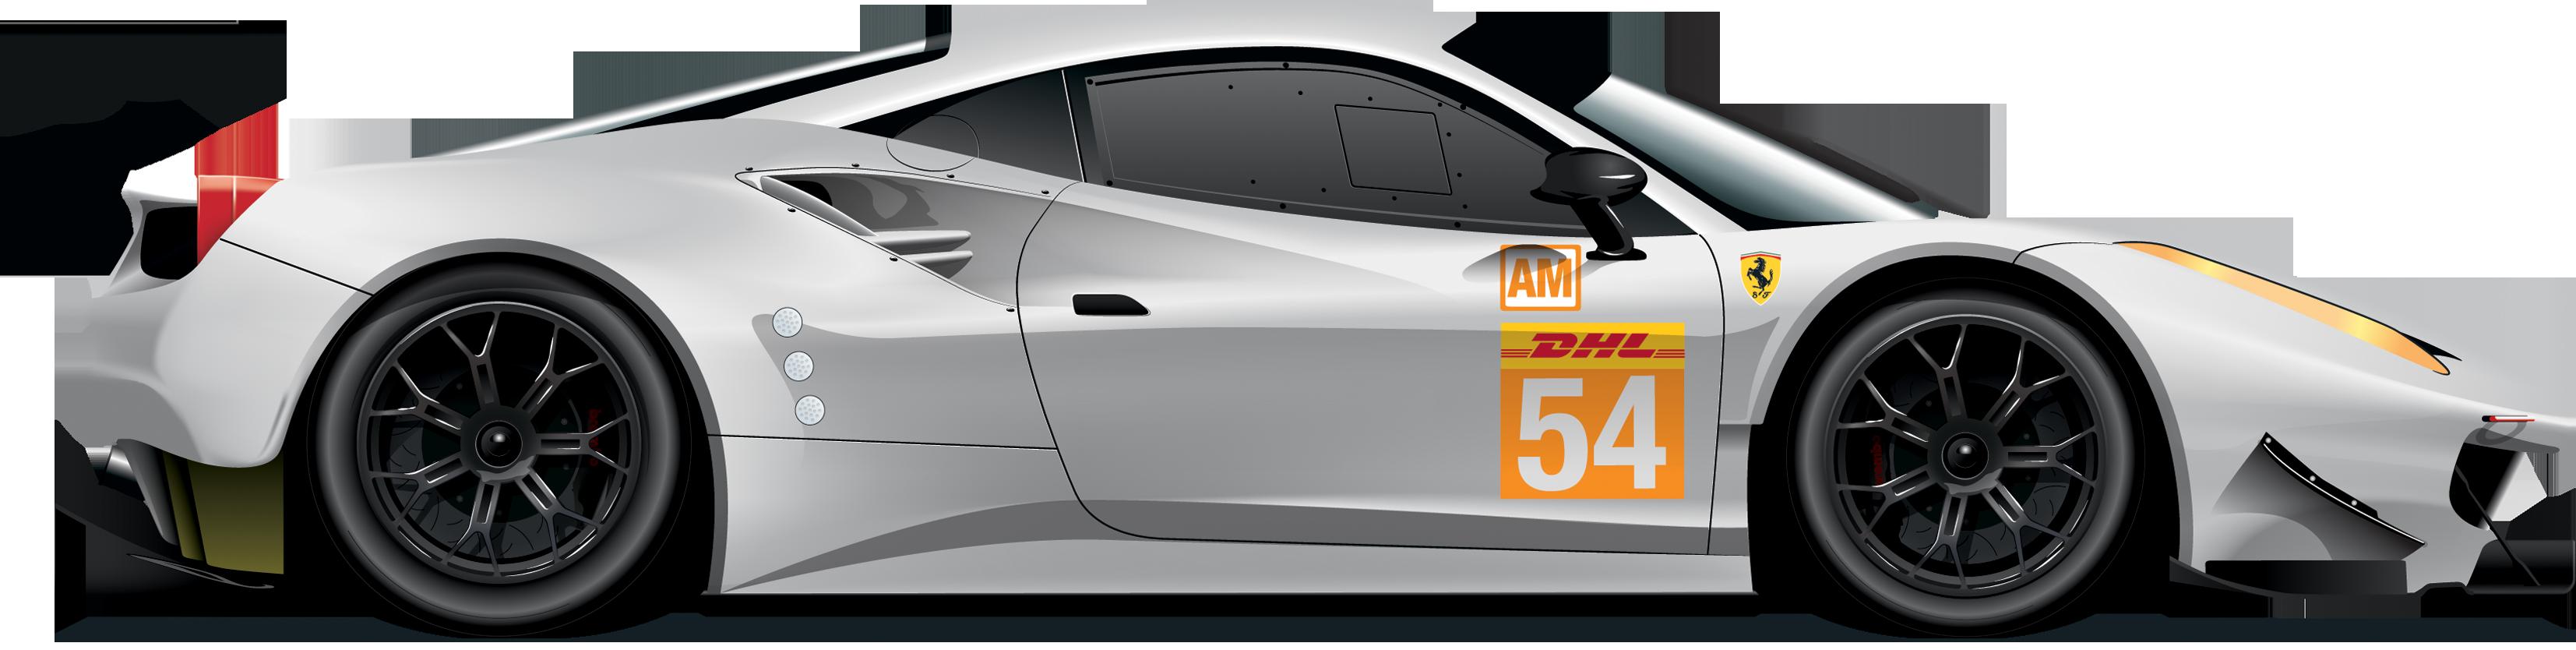 Ferarri clipart racing car PNG images racing image 488